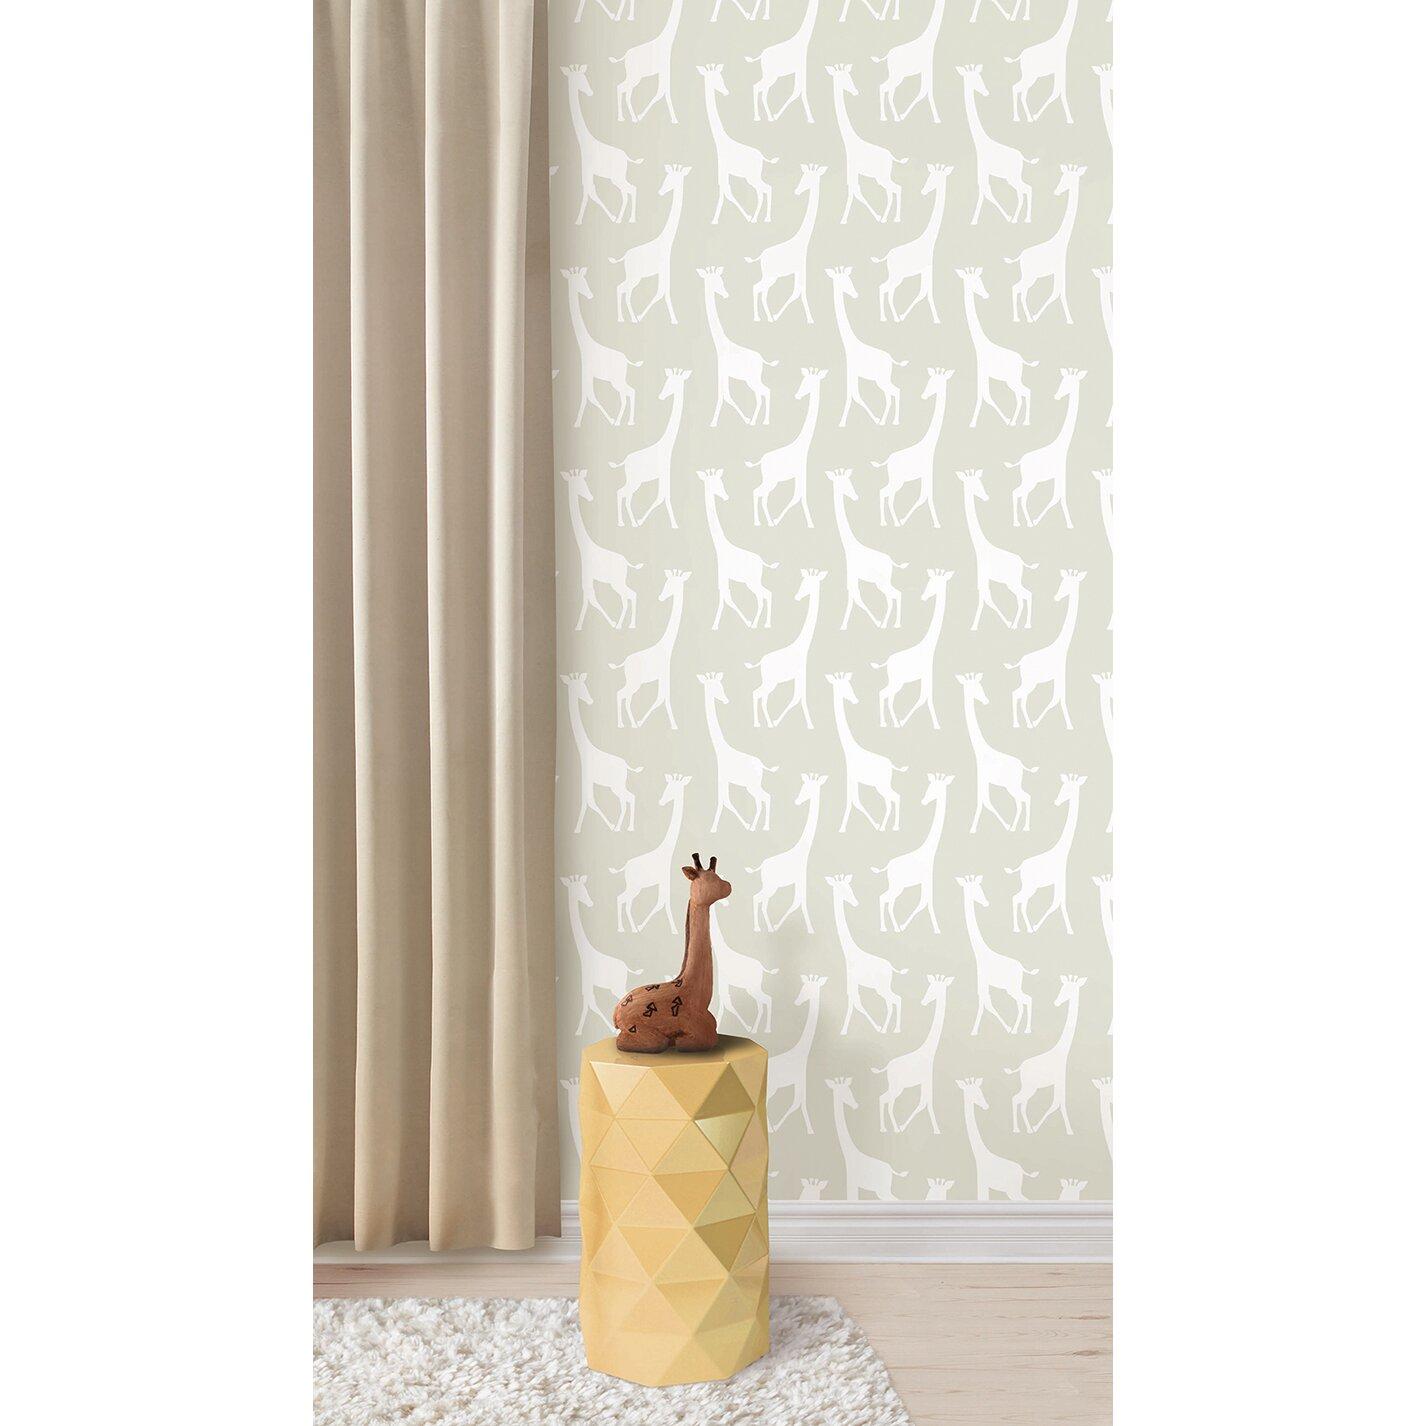 Wallpops savannah soiree peel and stick wallpaper for Self stick wallpaper